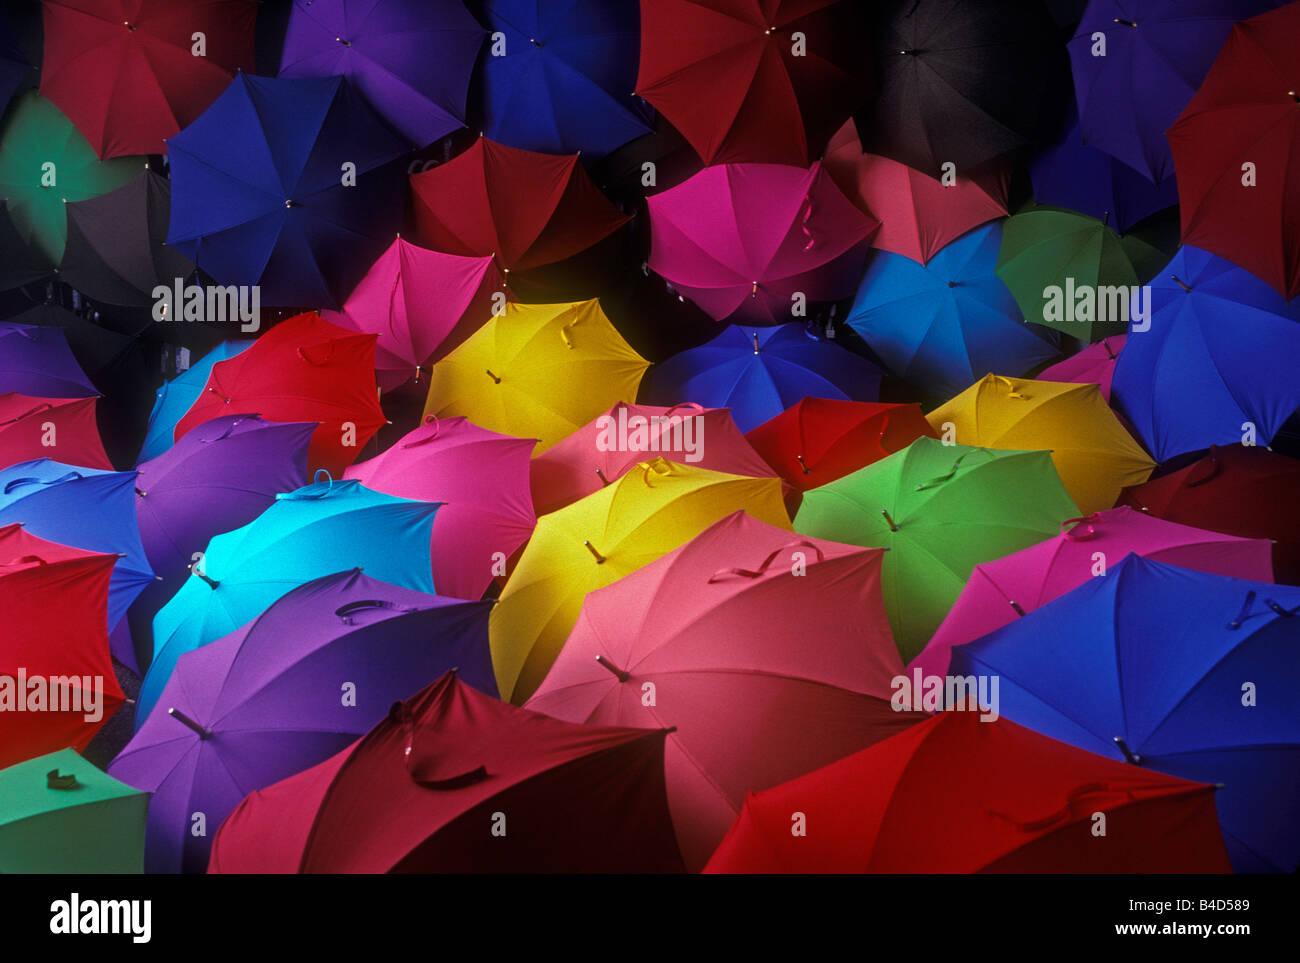 color umbrellas - Stock Image